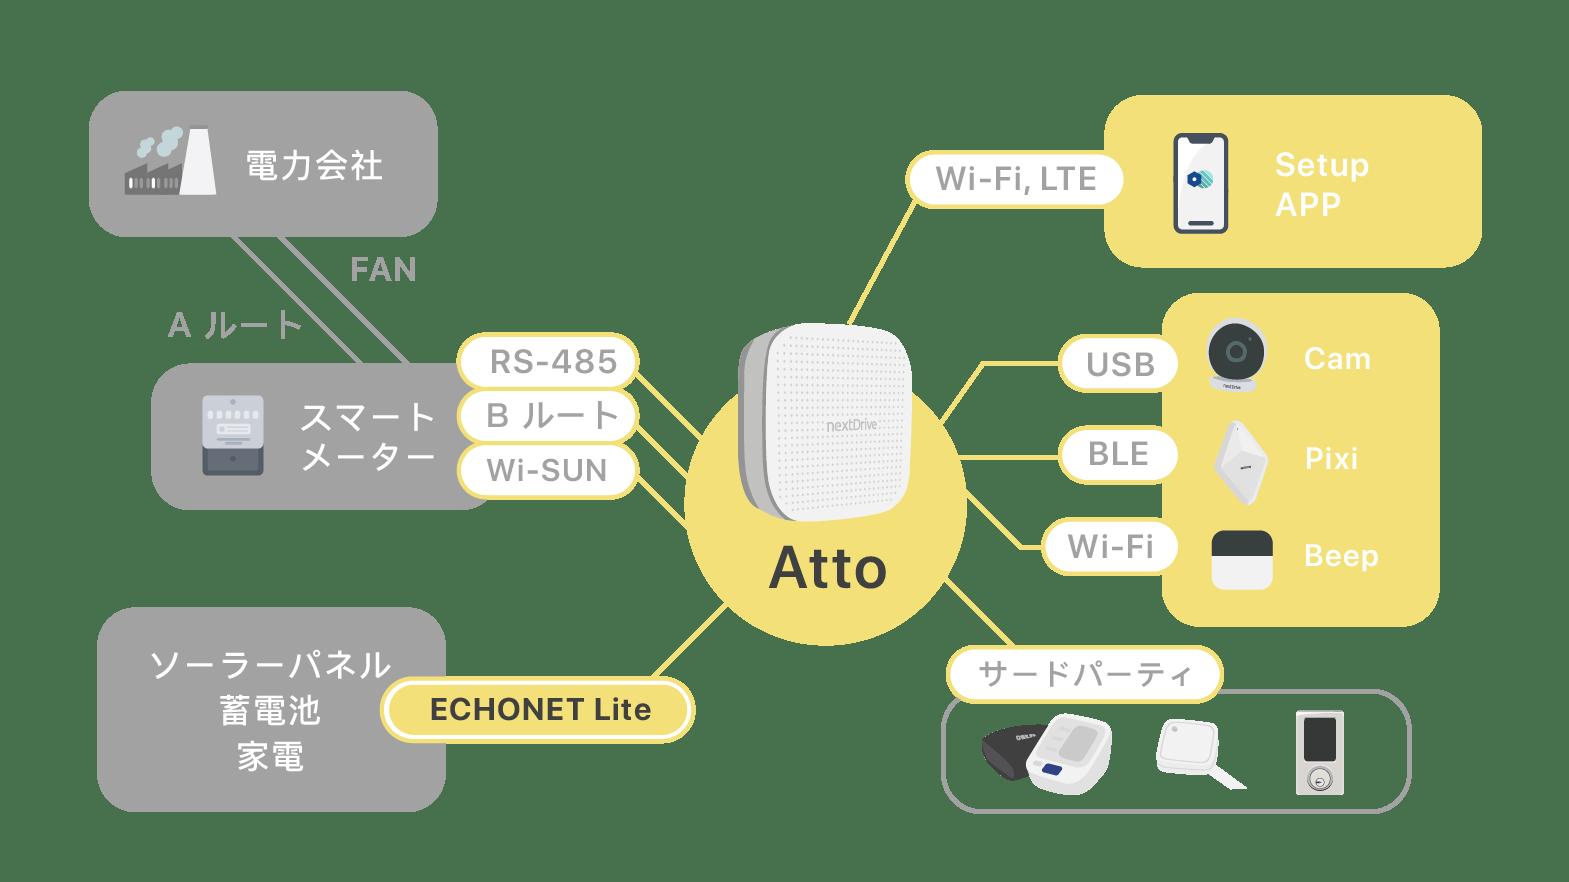 Atto 接続フレ—ムワ—ク